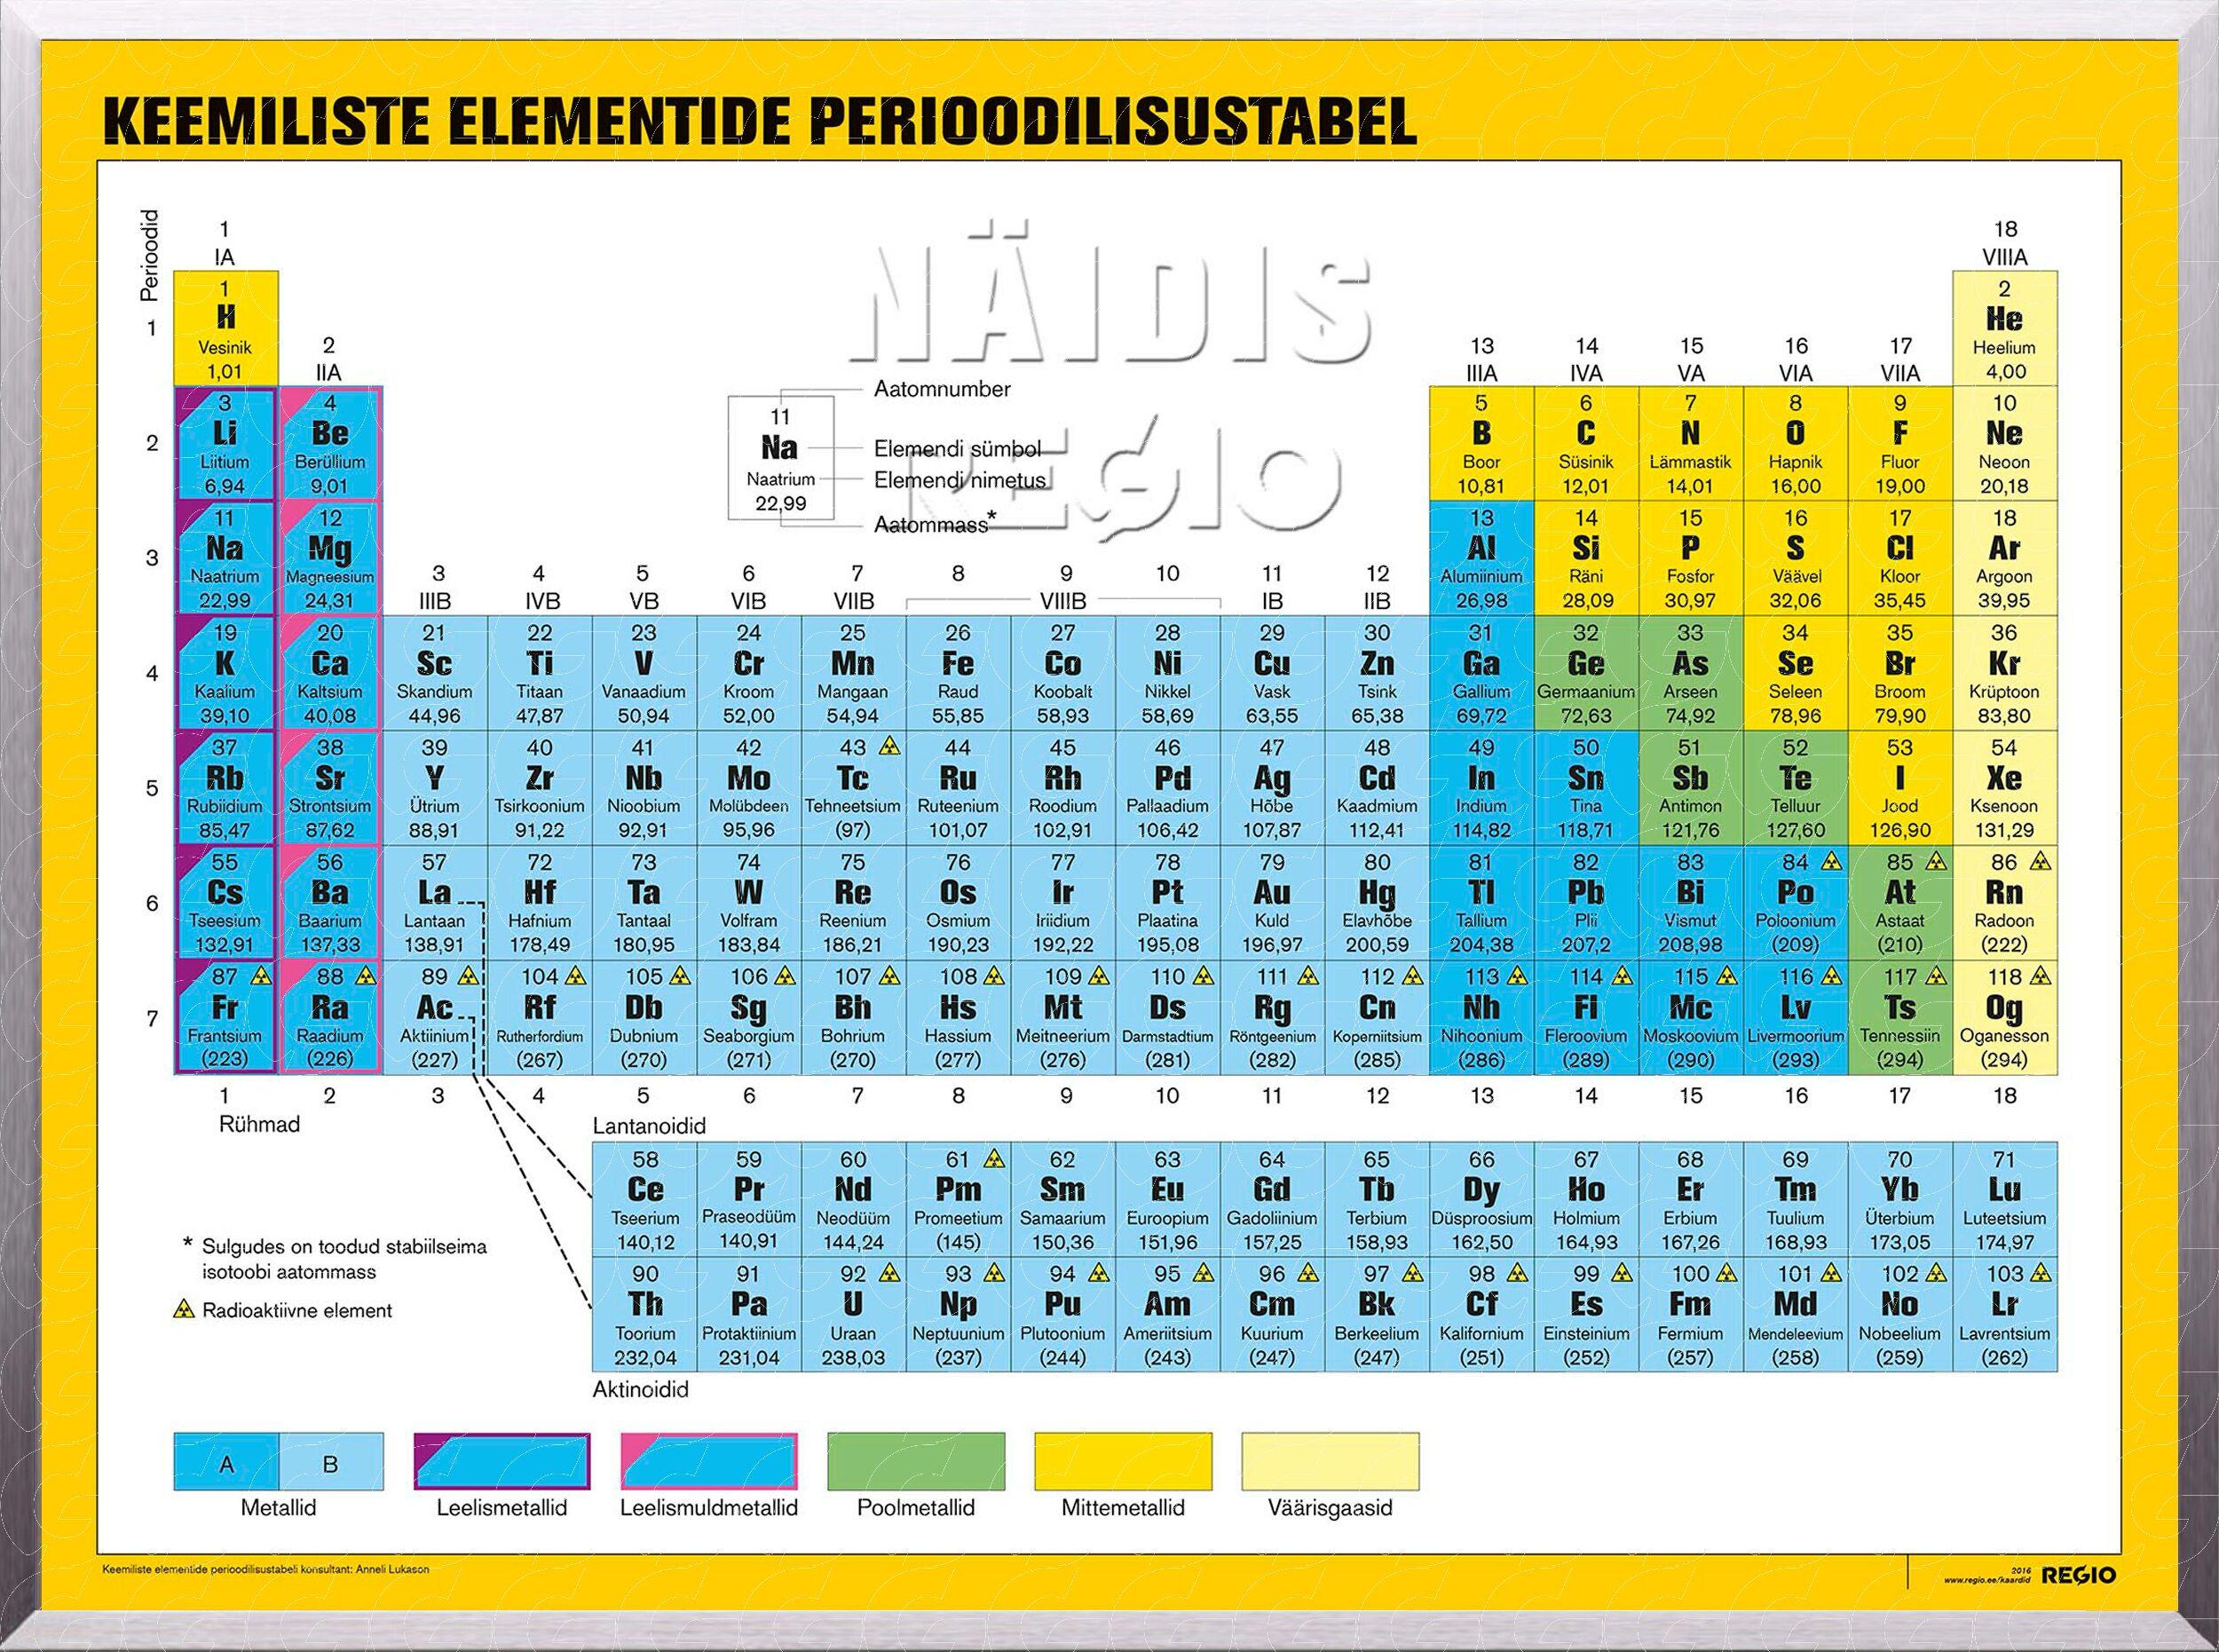 Keemiliste elementide perioodilisusssteem periodic table of the voro pt gamestrikefo Choice Image